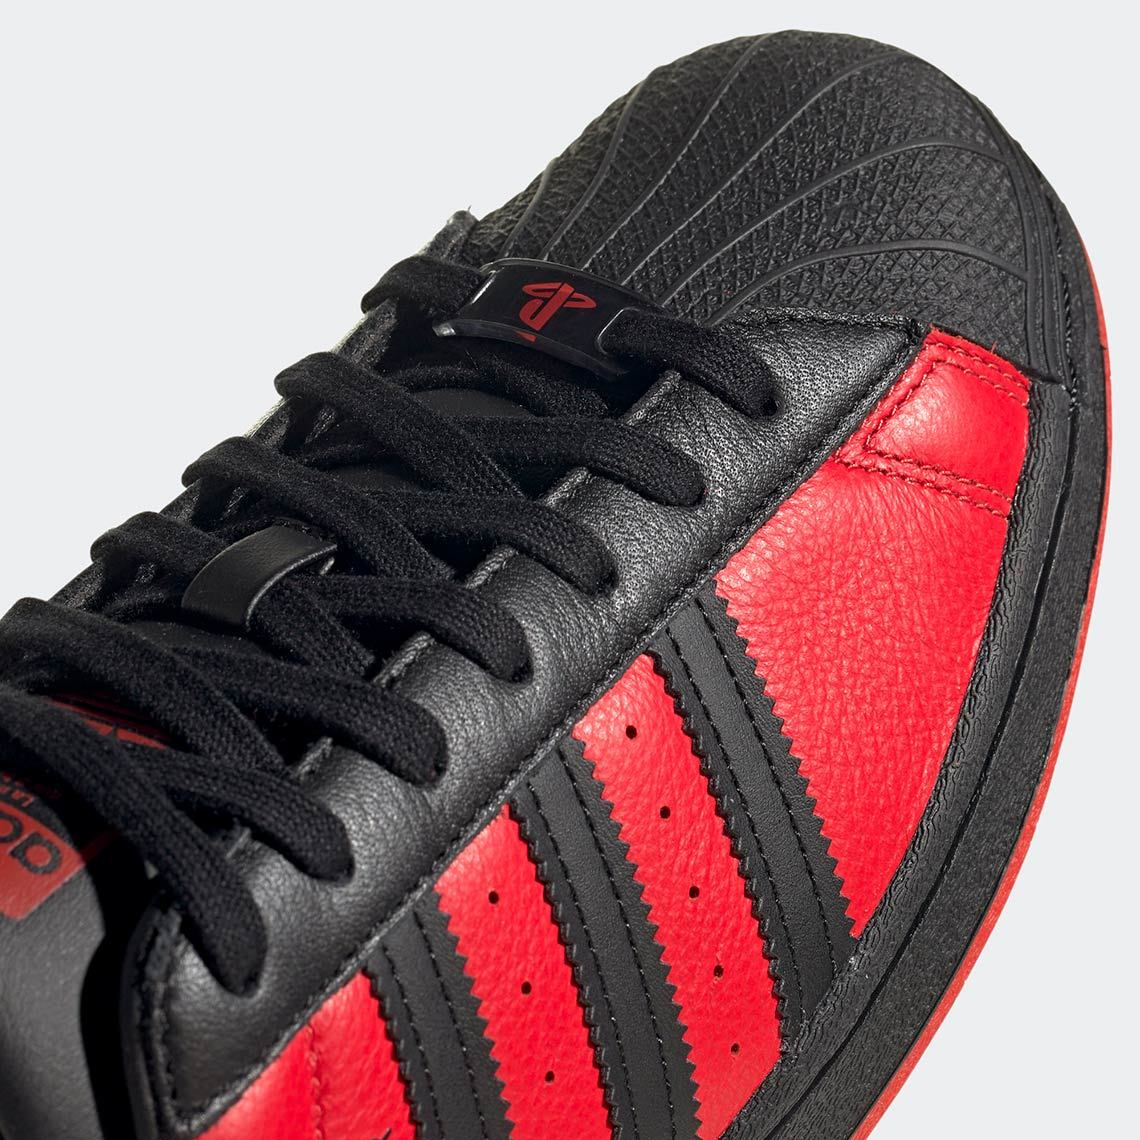 adidas Superstar ''Miles Morales'' - GV7128